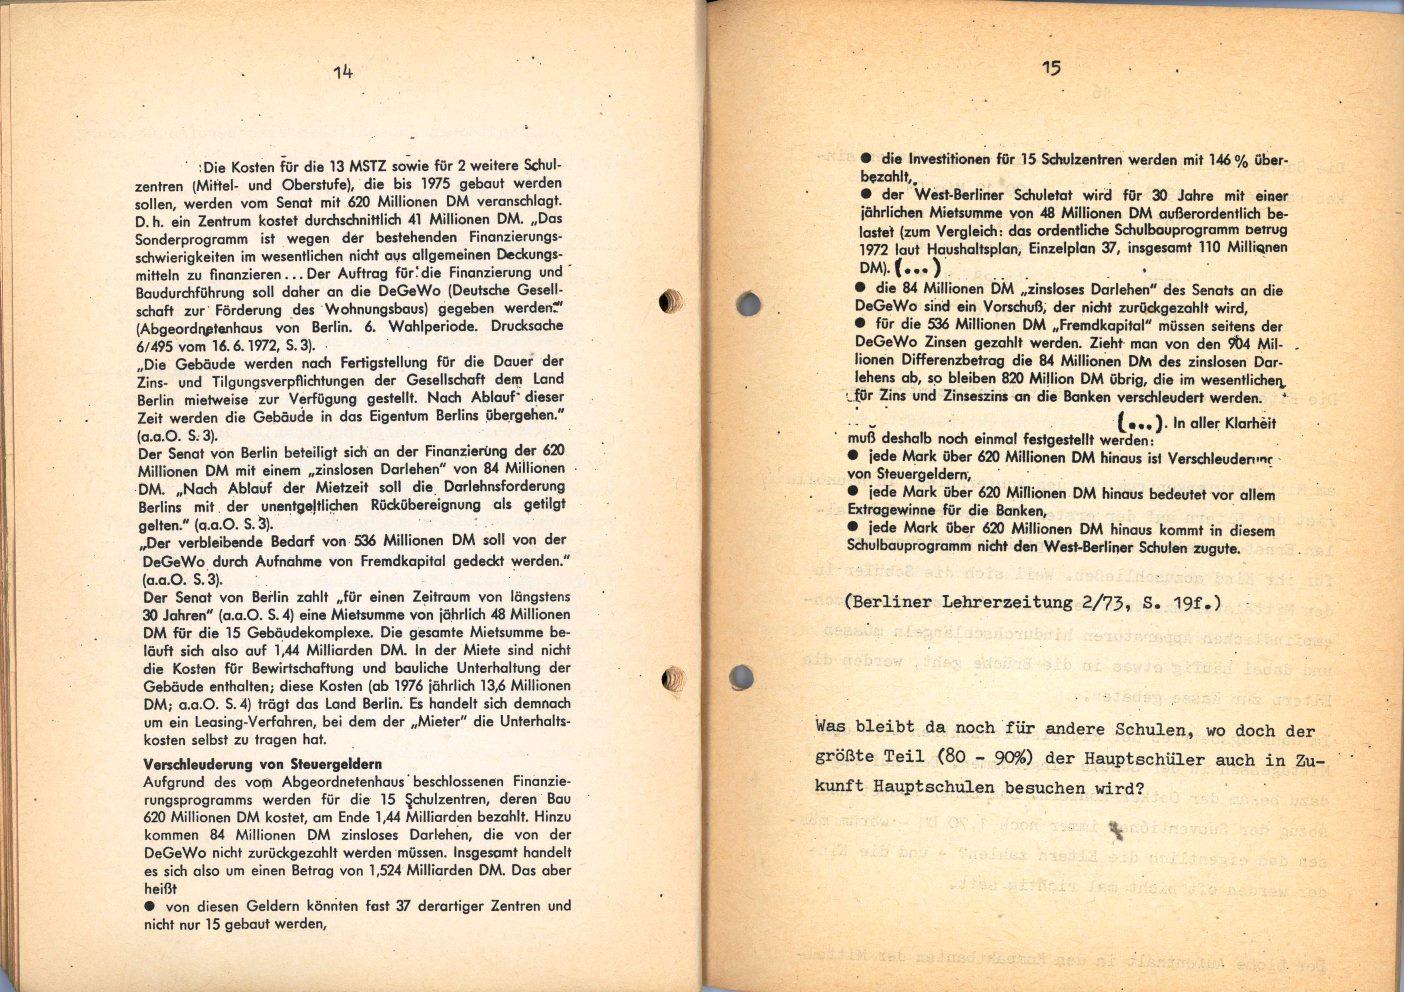 Berlin_SMV_GUV_1974_Schulmisere_10